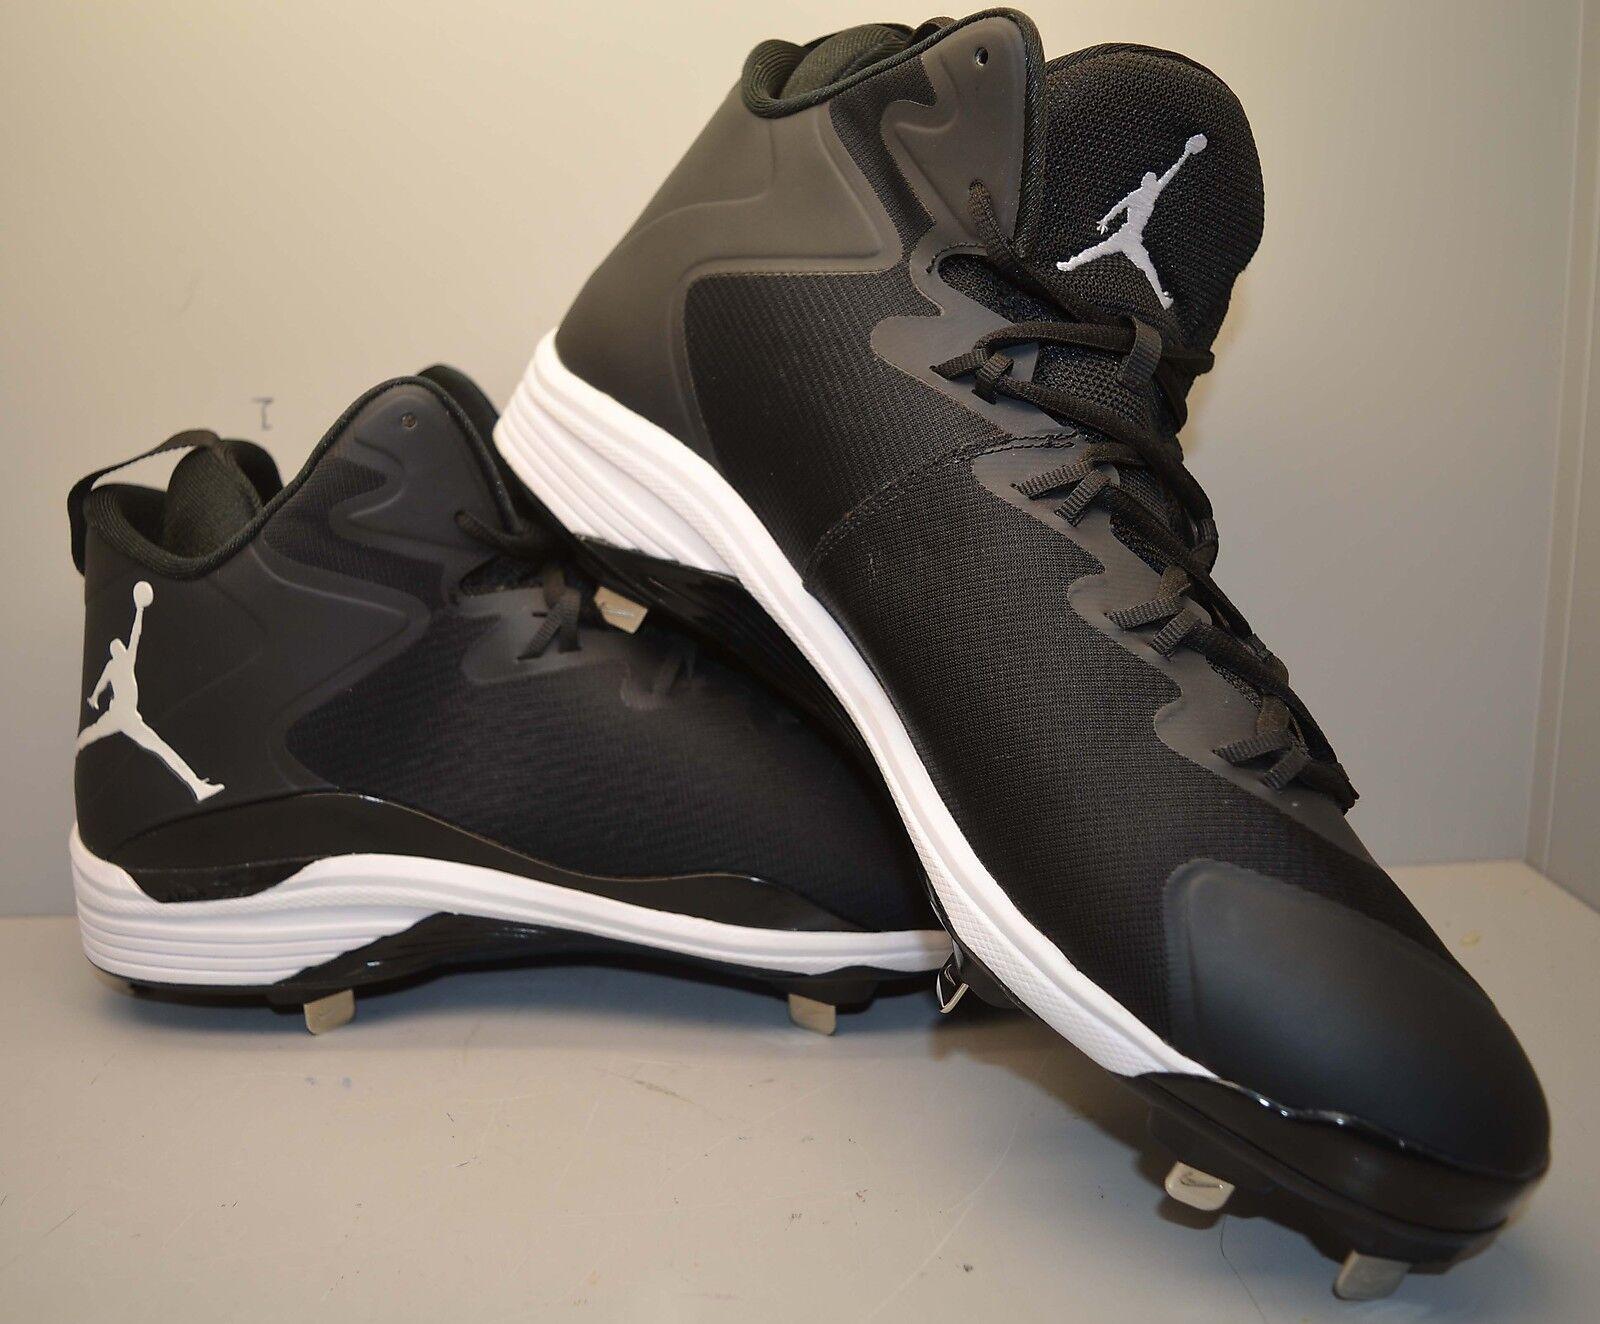 Nike Jordan Super Fly 3 Metal Baseball Cleats 684941-010 Comfortable Seasonal price cuts, discount benefits